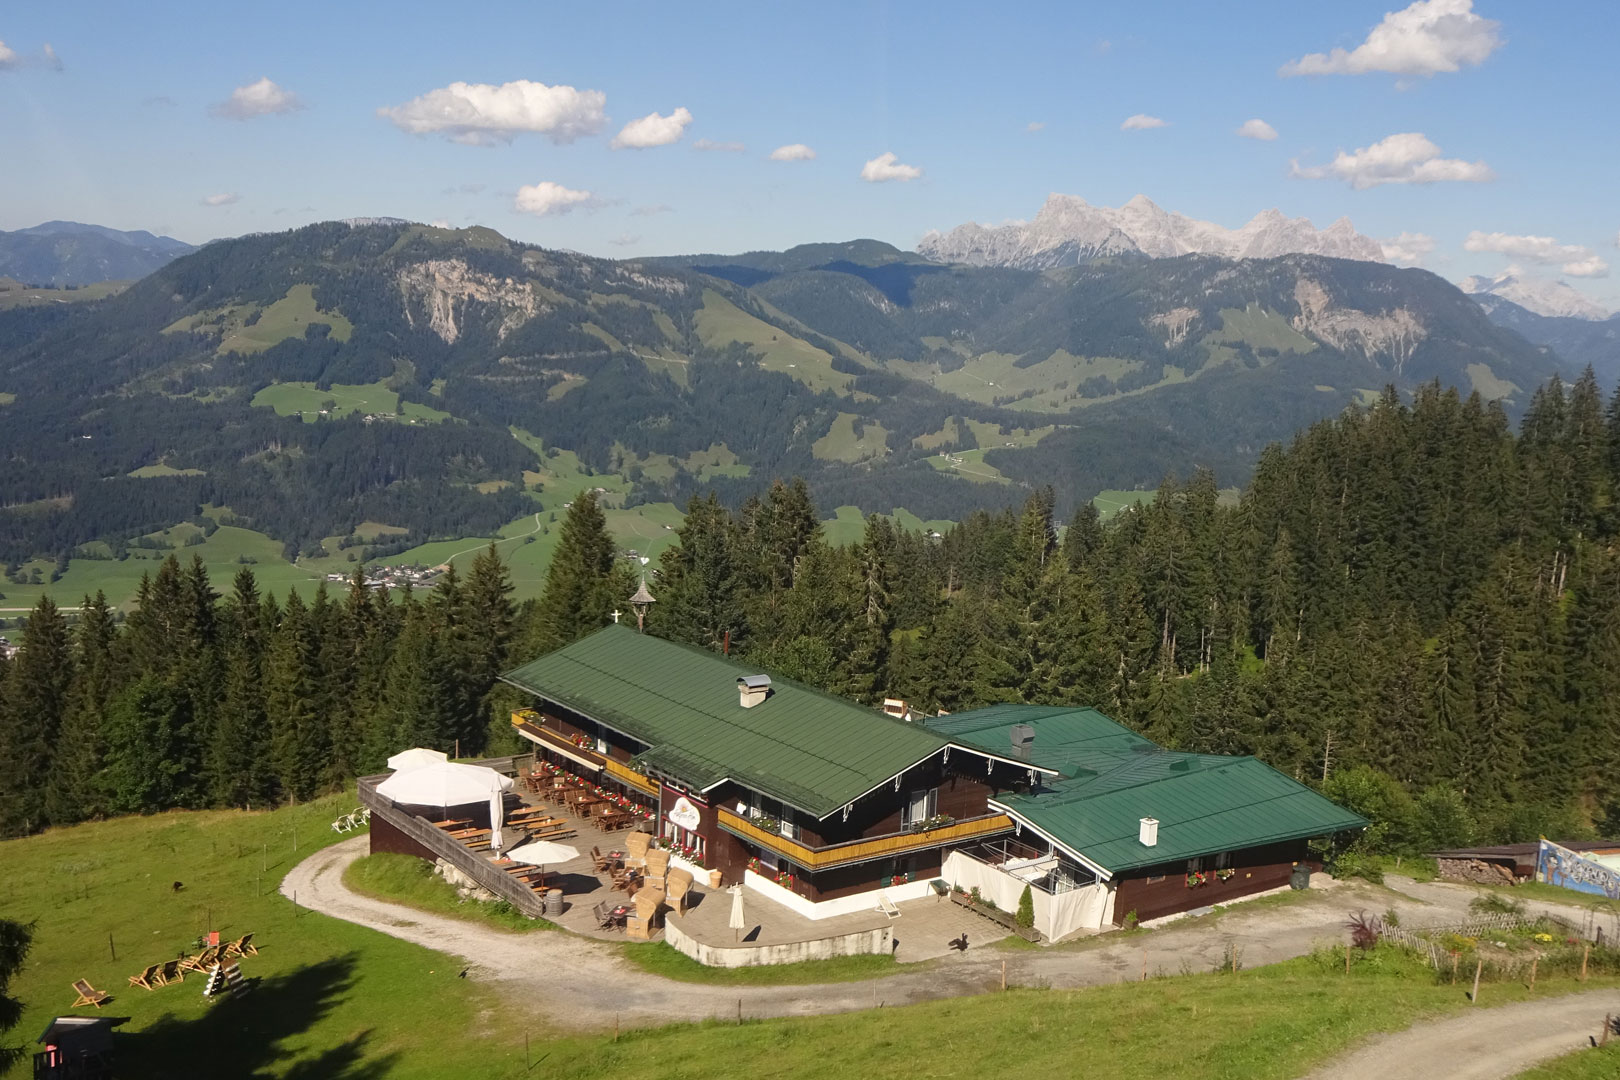 Willkommen! - Kferfreunde St. Johann - St. Johann in Tirol